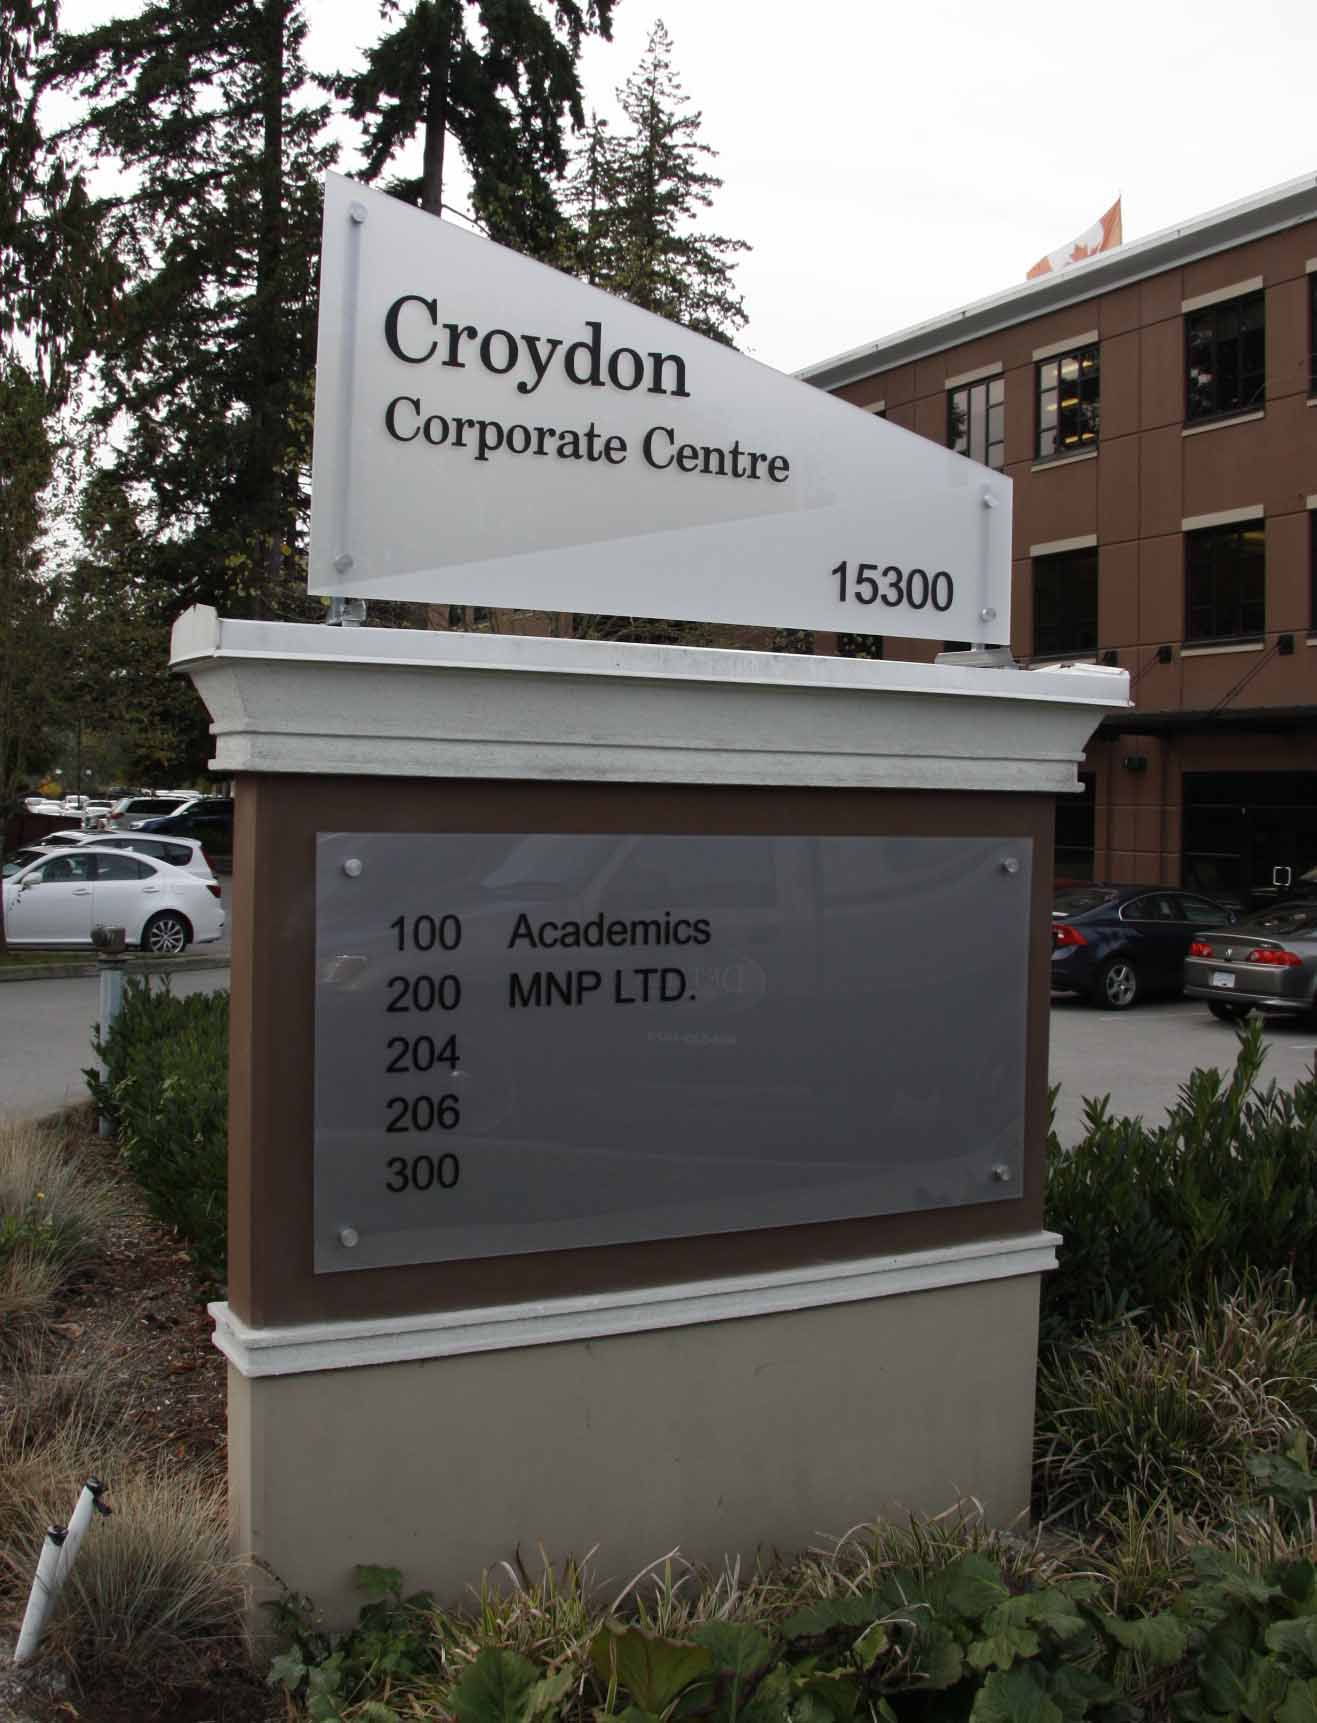 Croydon directory